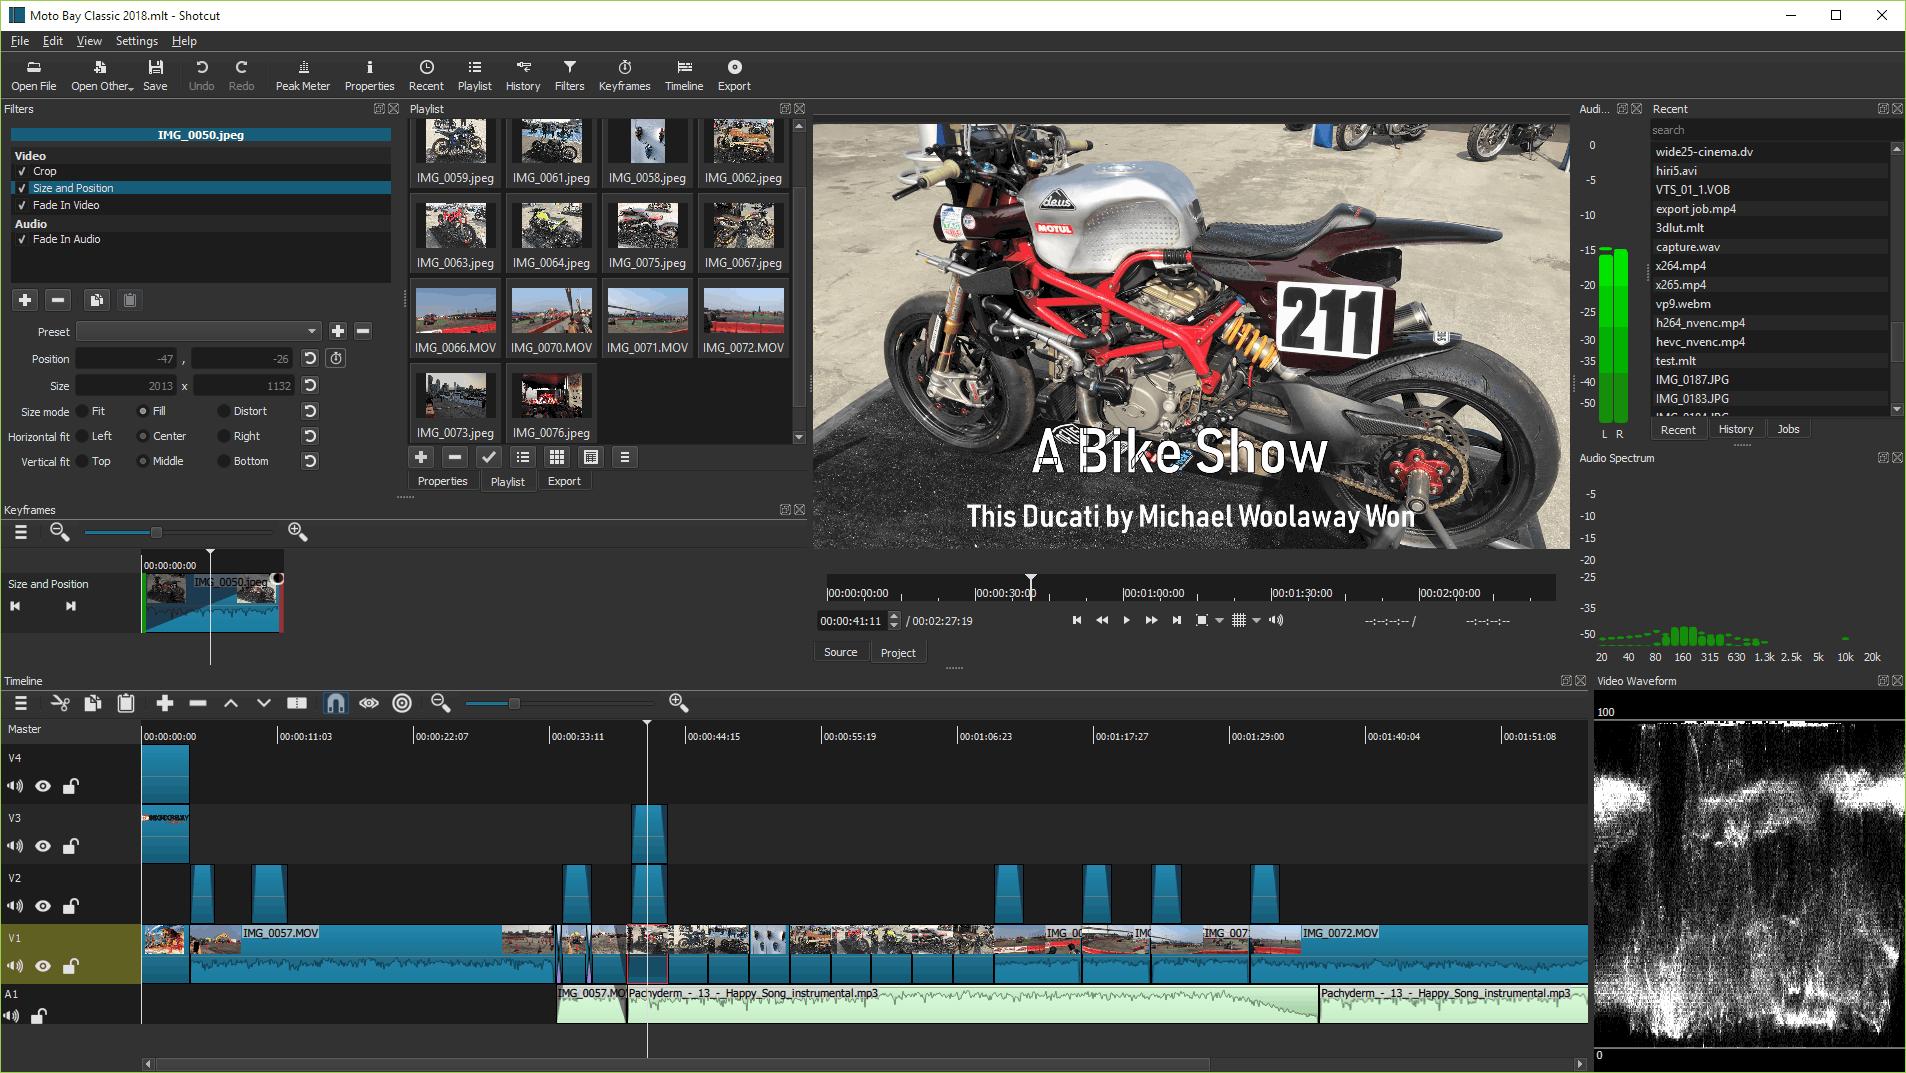 Software Di Editing Video Per Windows 11